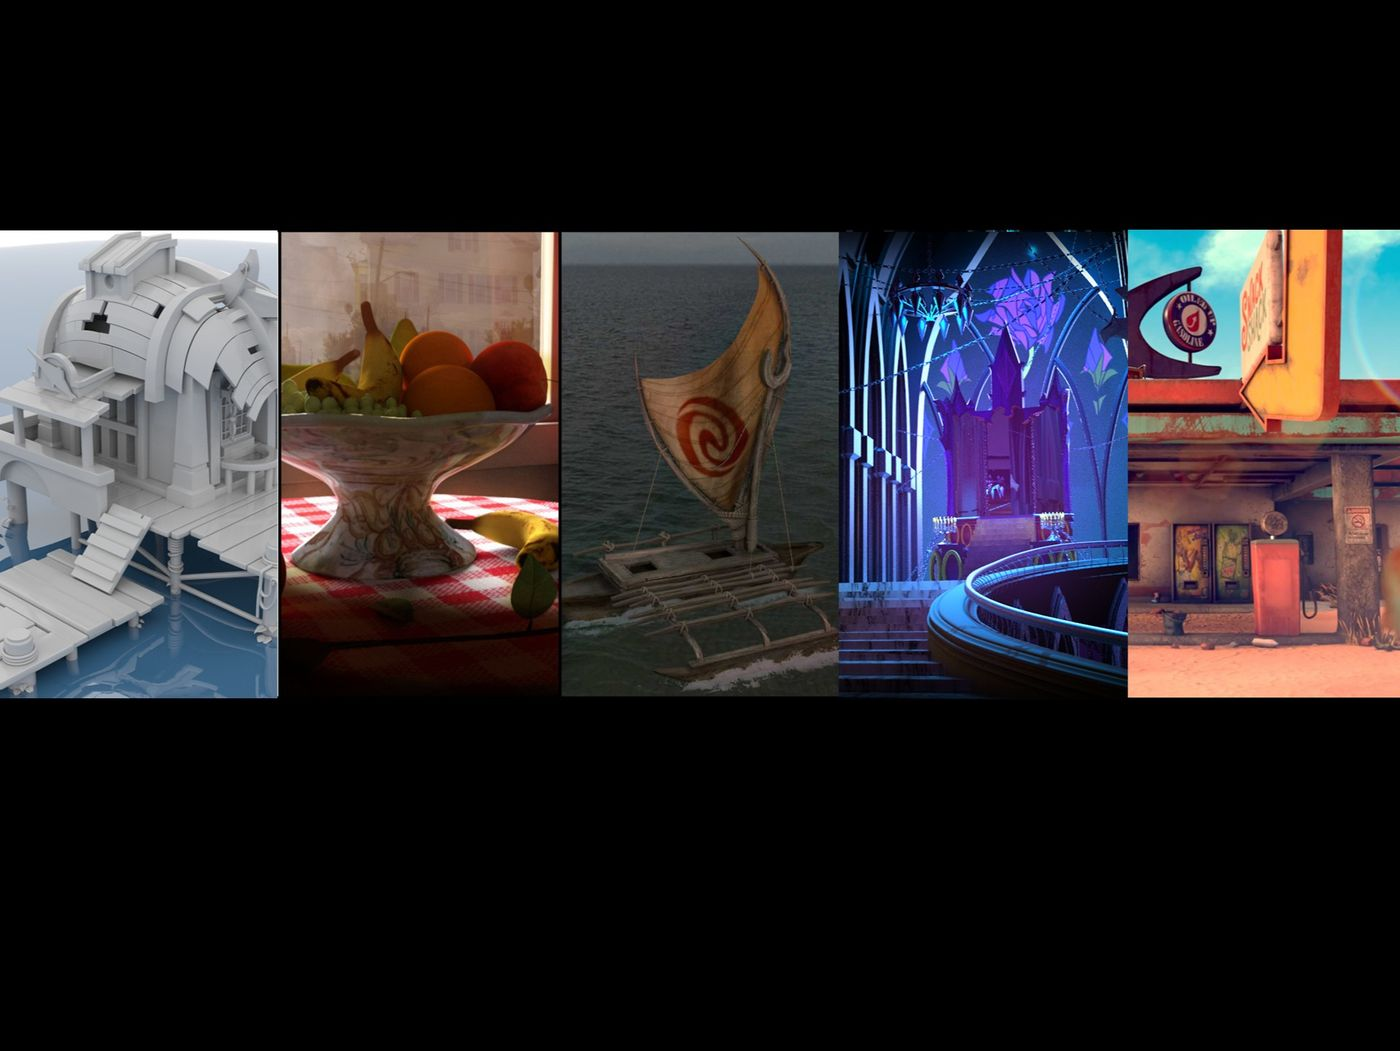 Rookie Awards 2019 - 3D Animation